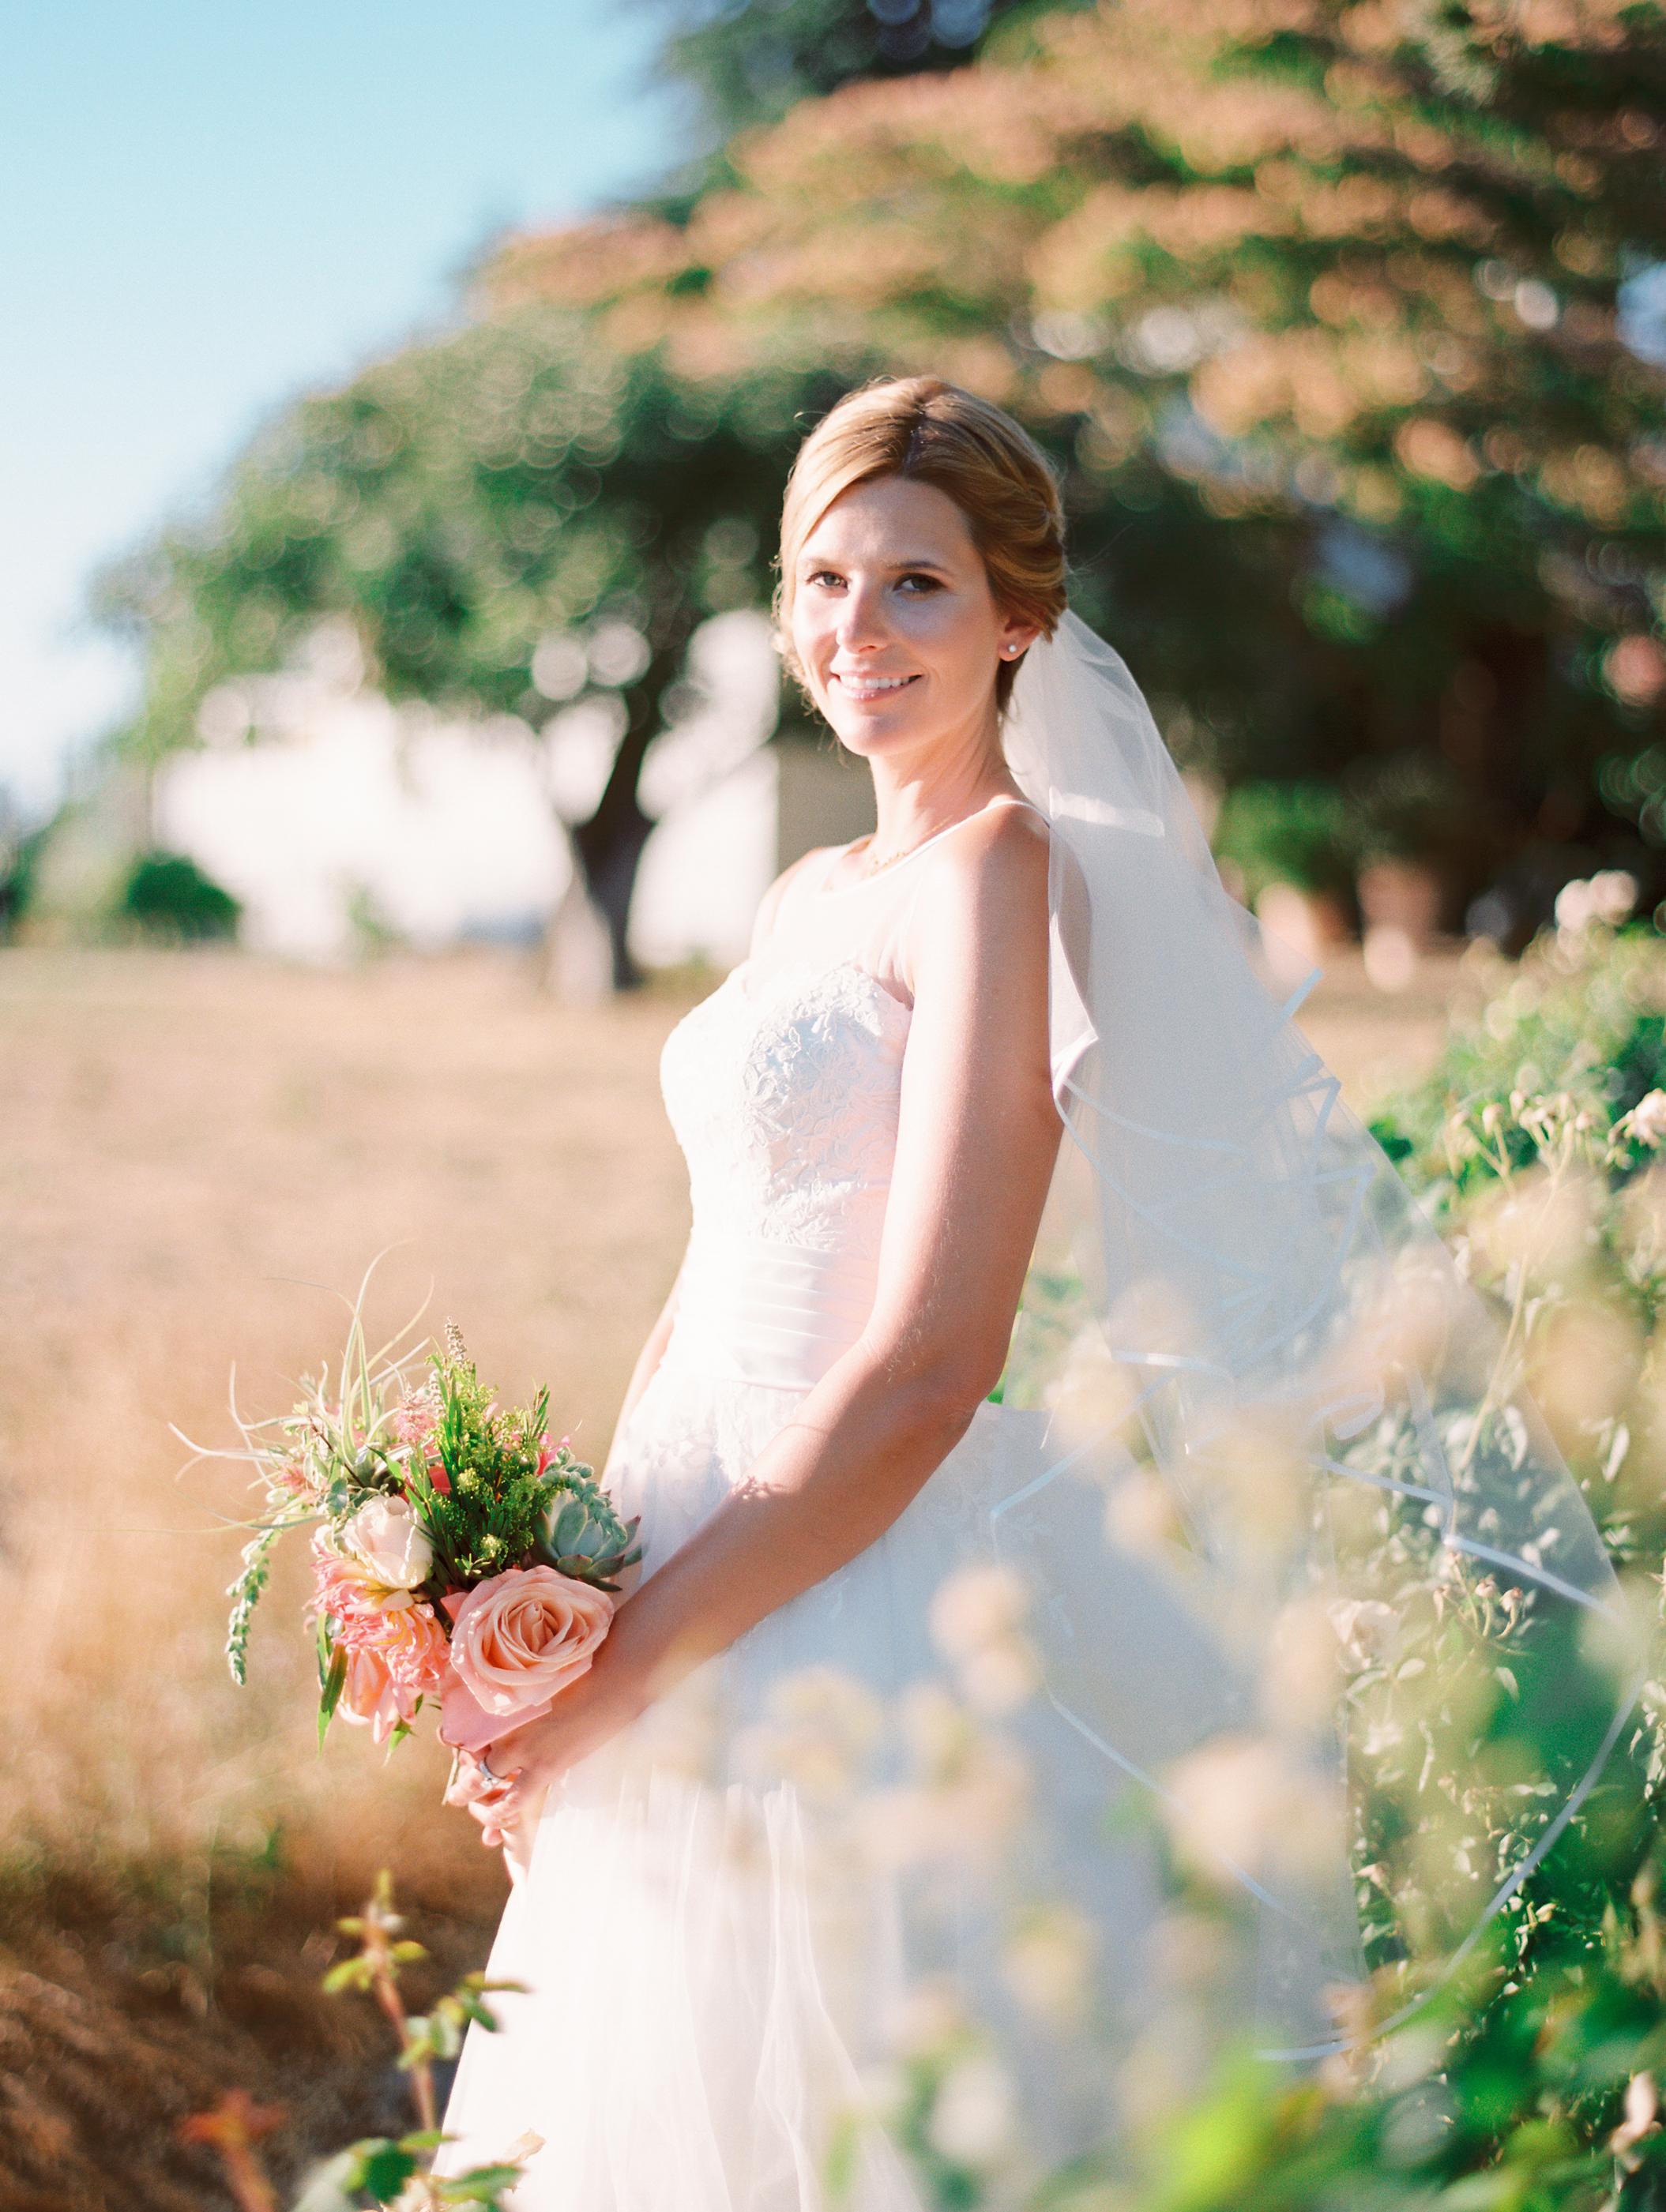 Anders Wedding by Jessica Garmon-395.JPG